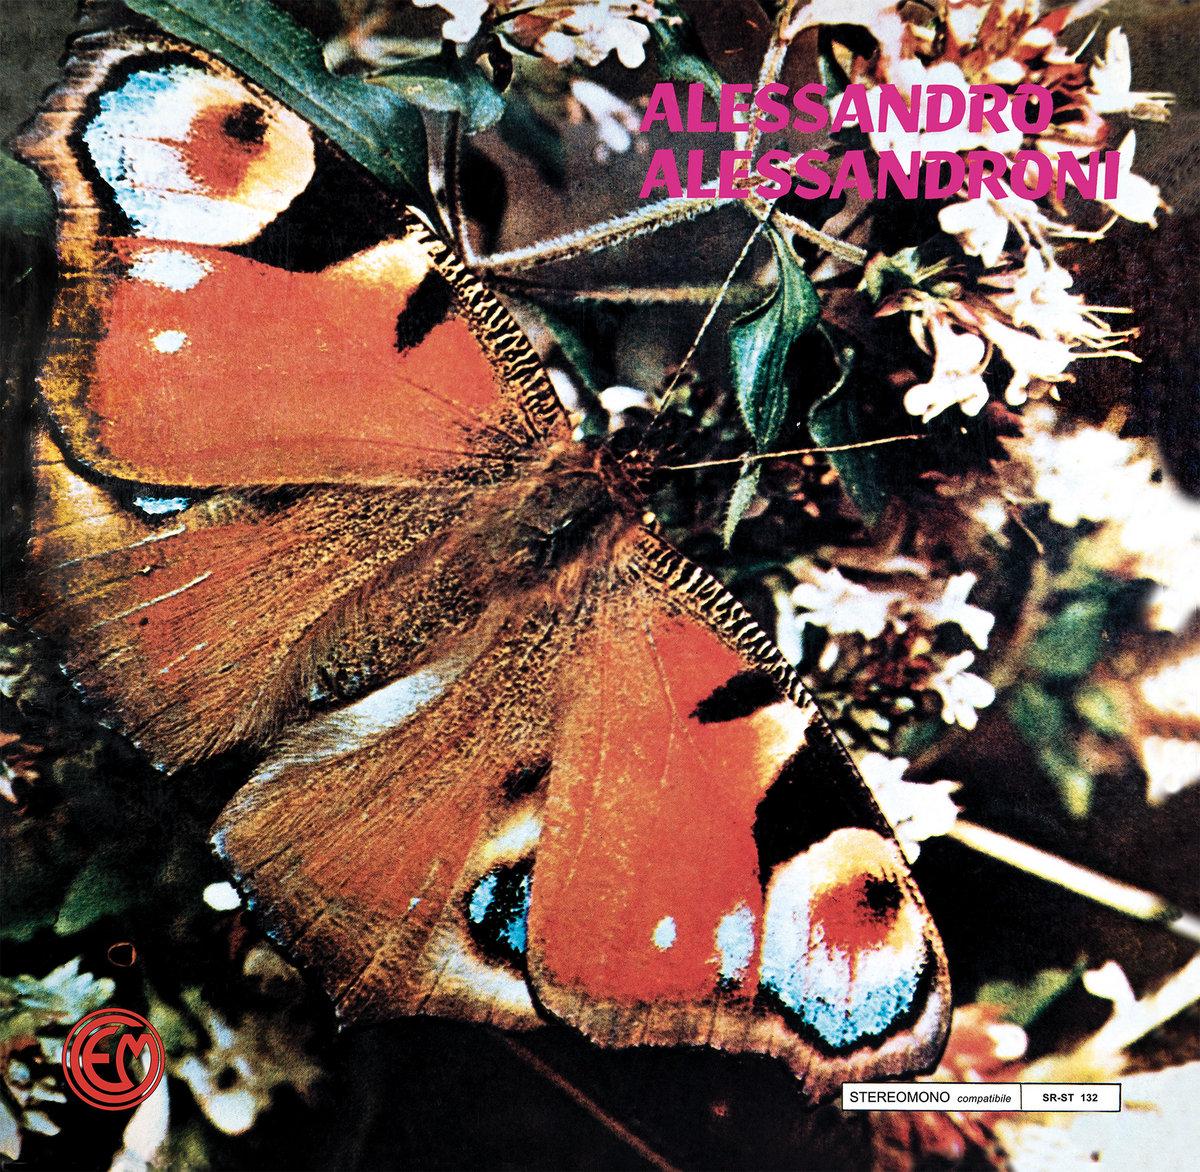 ALESSANDRO ALESSANDRONI (Farfalla)